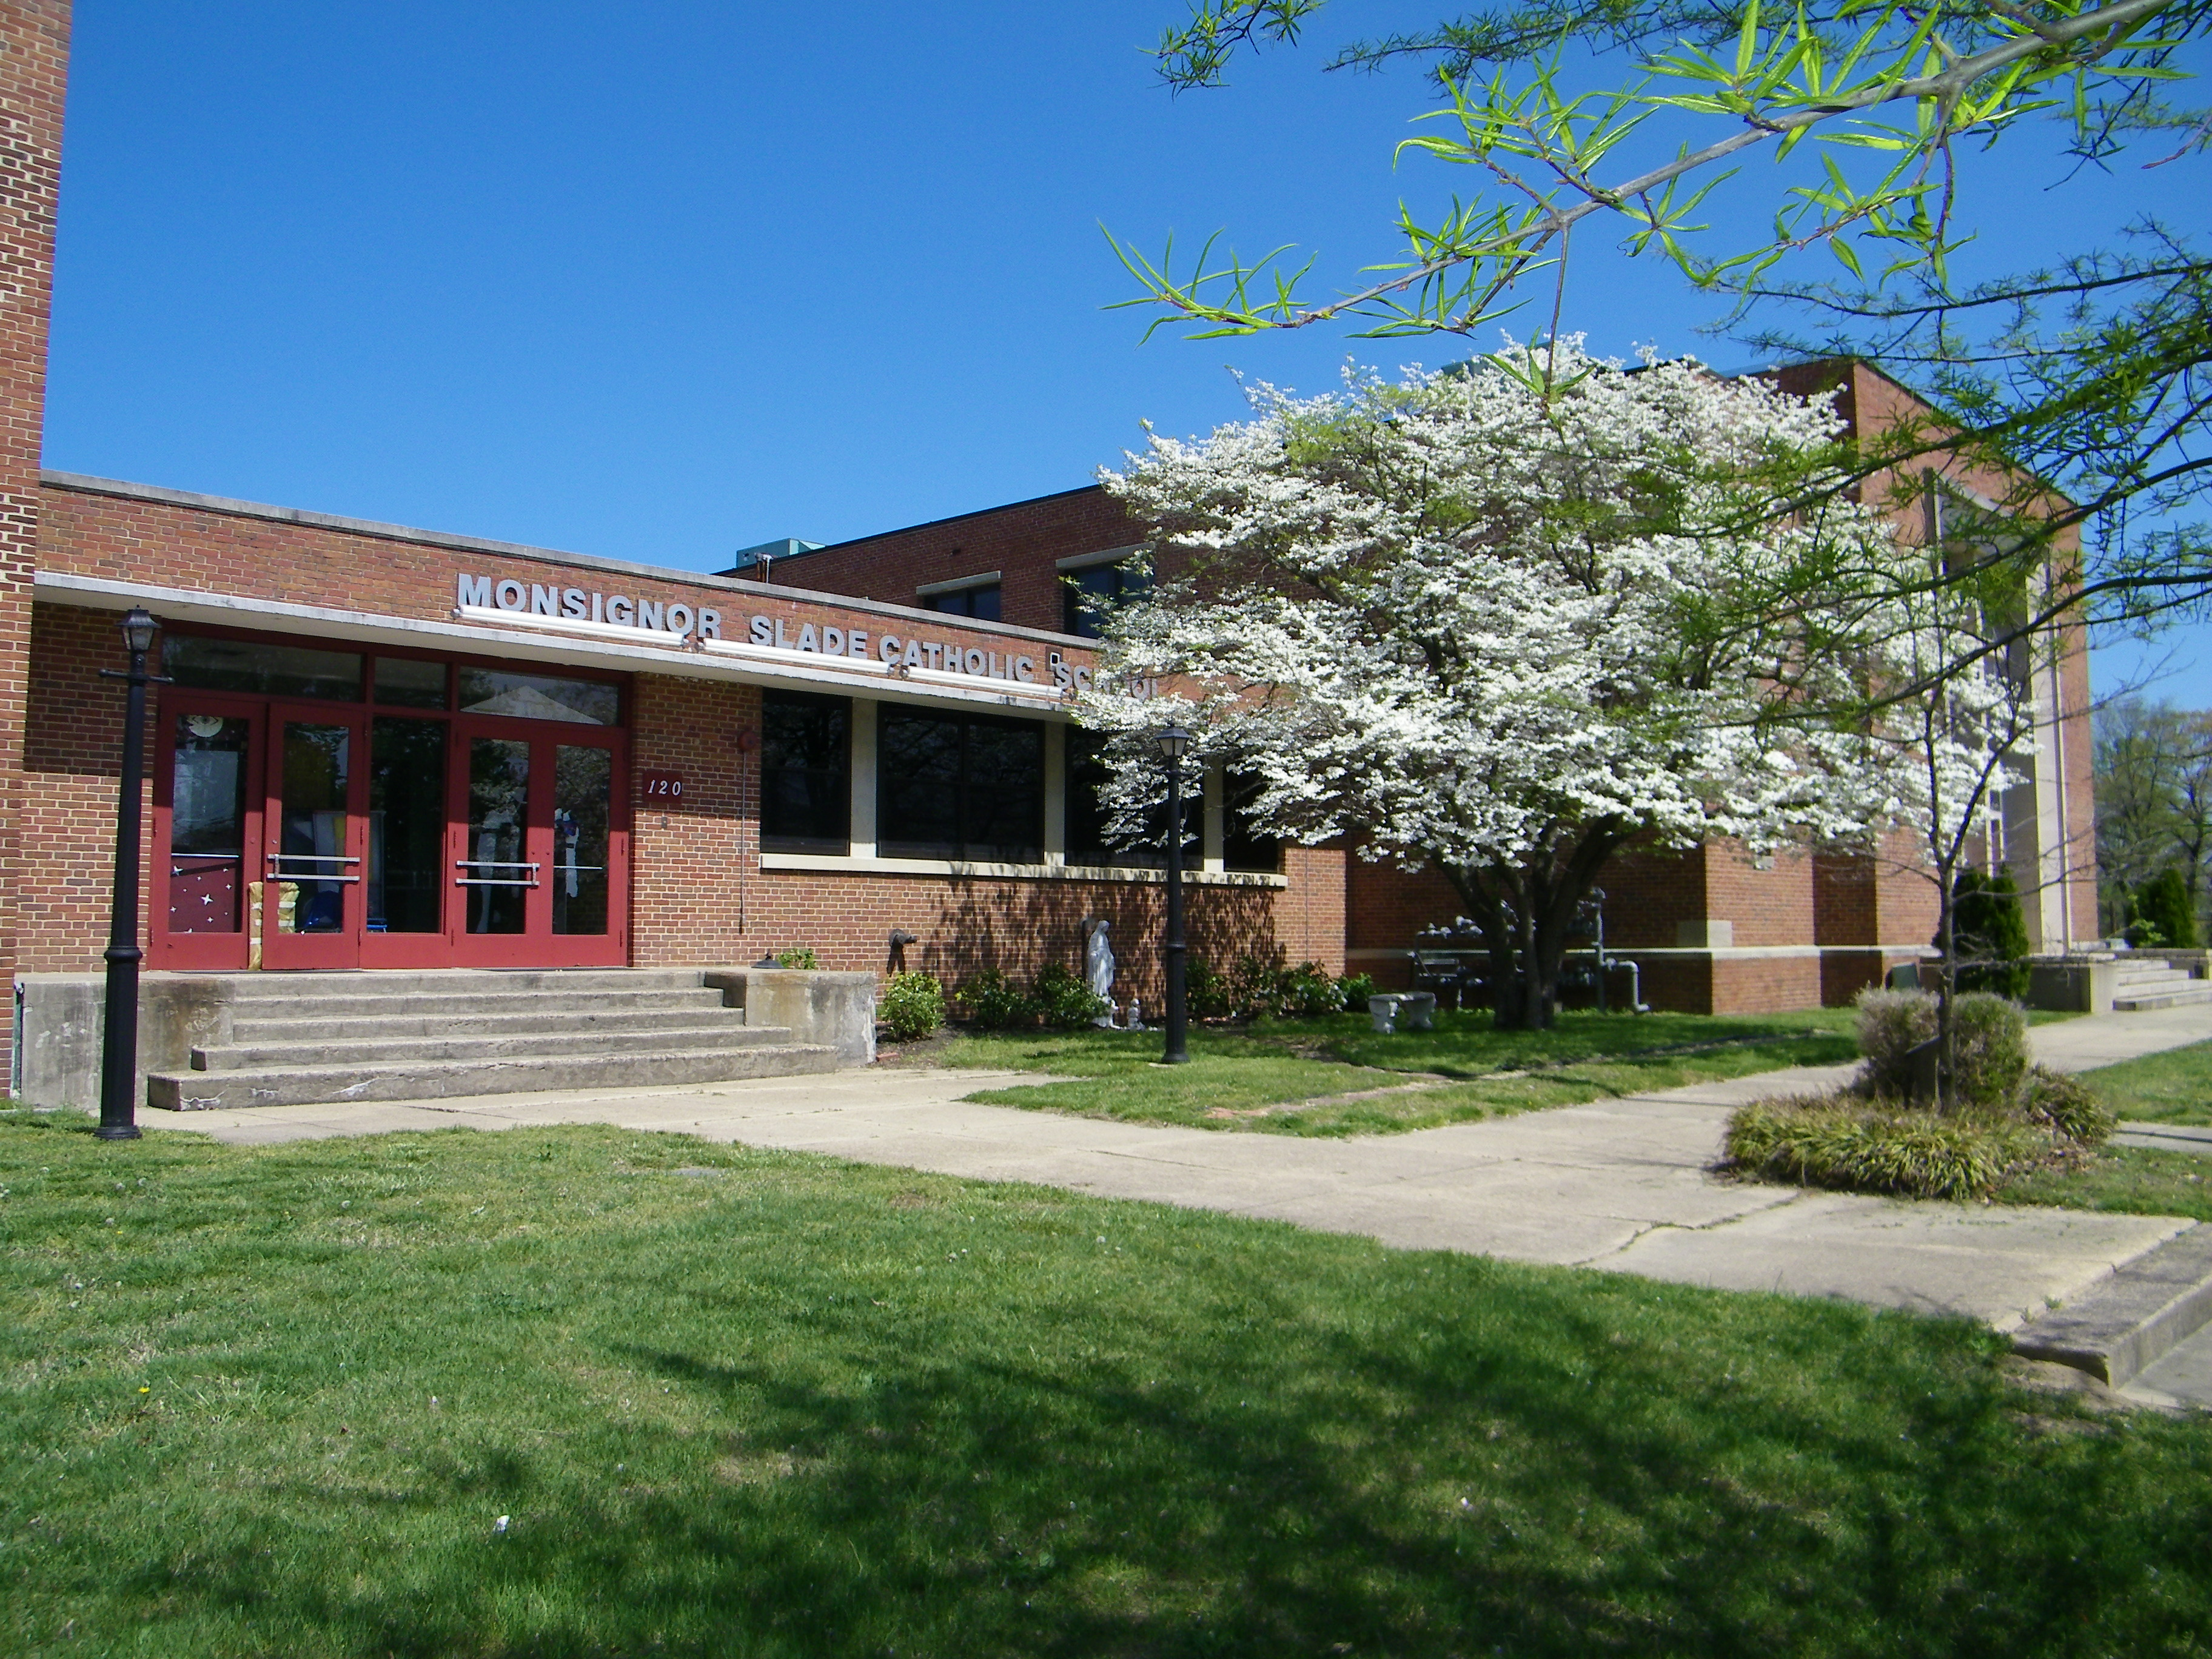 Monsignor Slade Catholic School